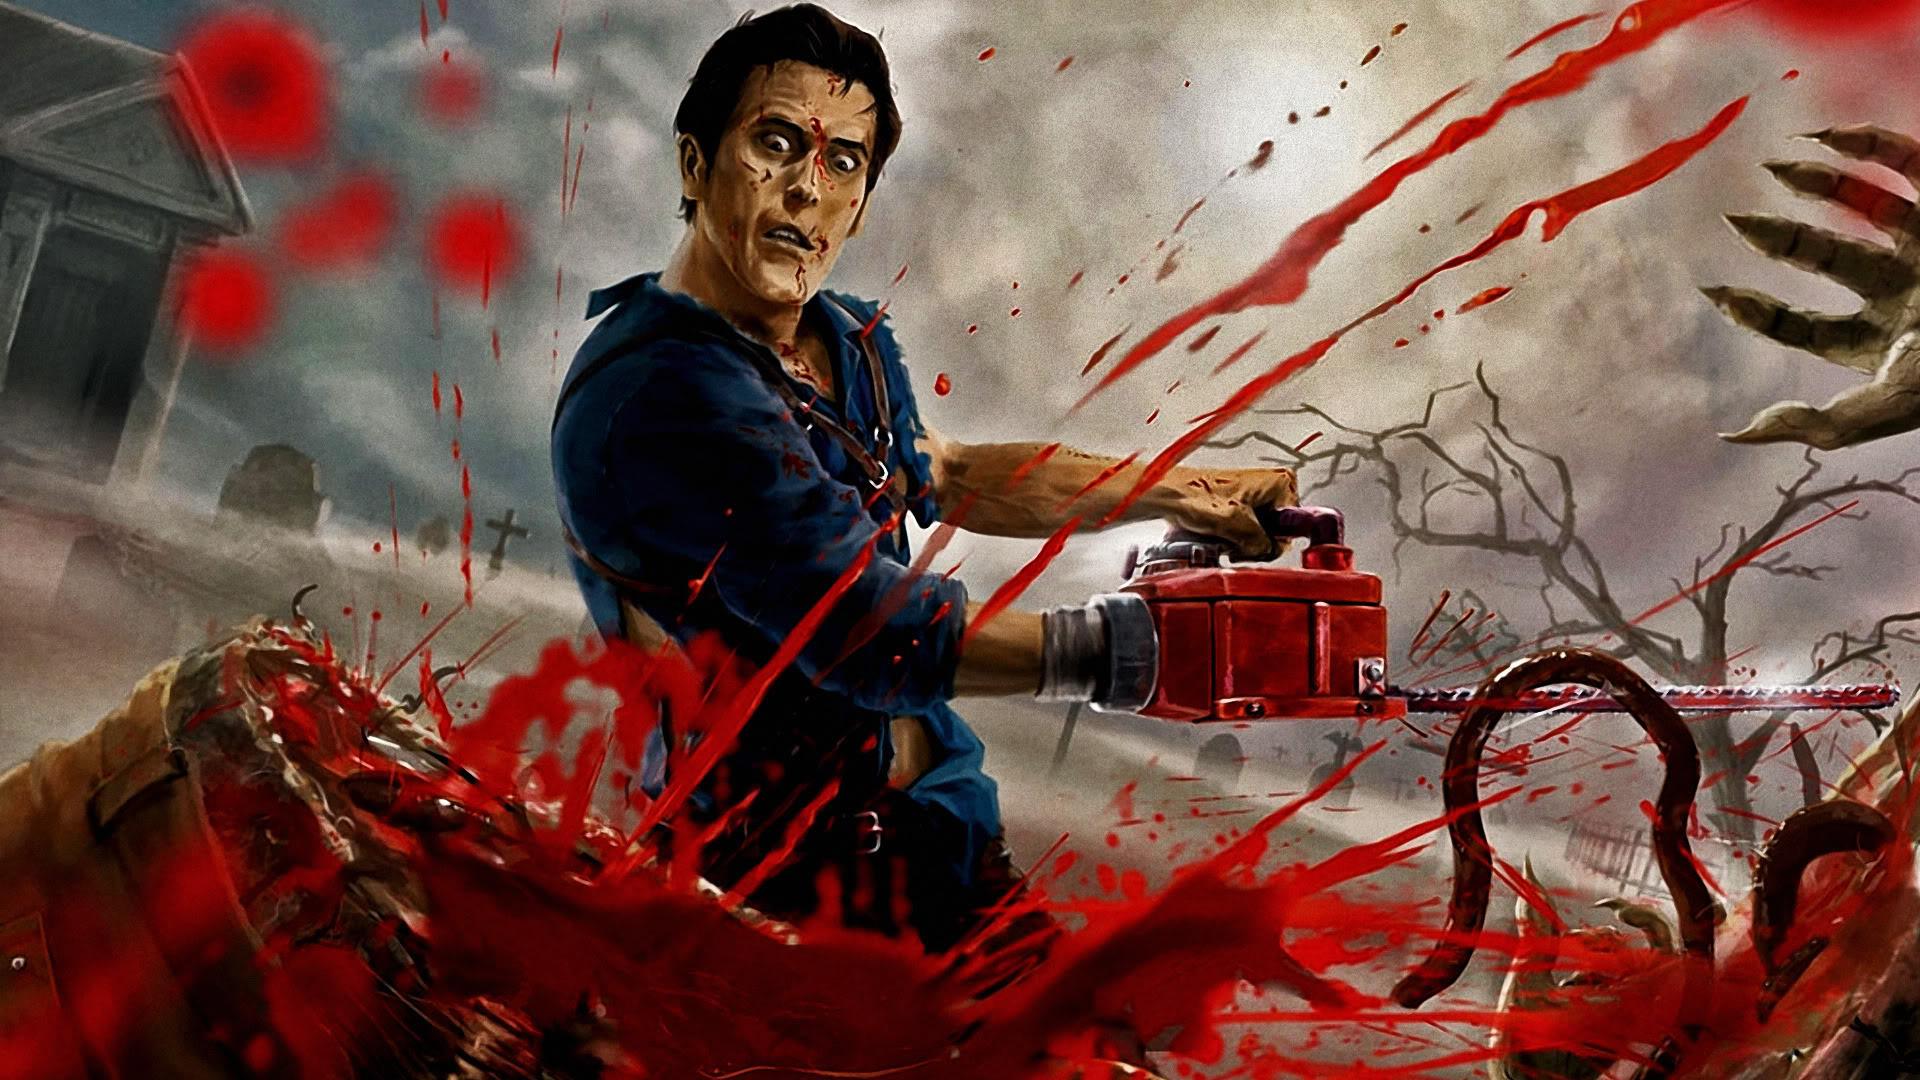 Evil Dead Wallpapers HD - WallpaperSafari